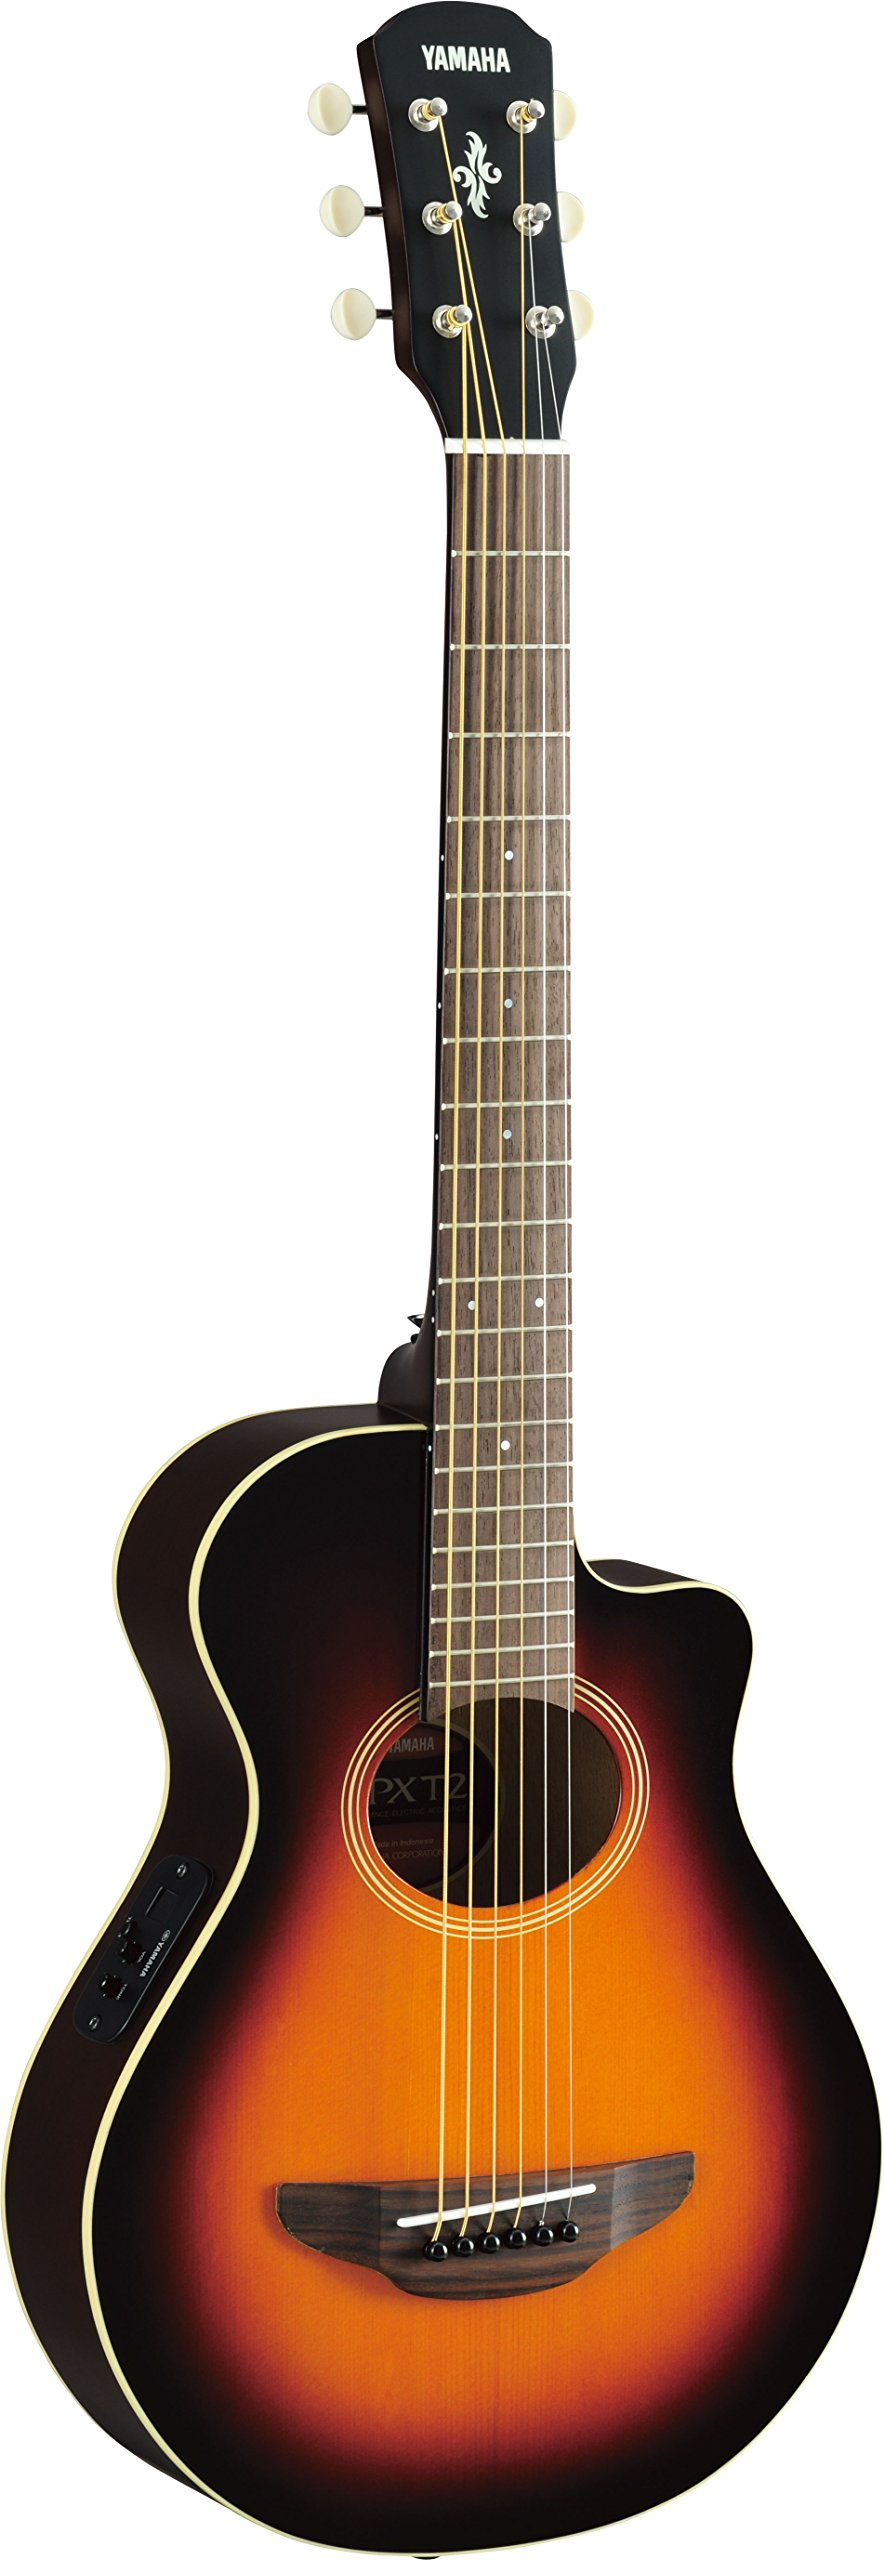 Yamaha APXT2 3/4 Thinline Acoustic-Electric Cutaway Guitar Old Violin Sunburst by YAMAHA